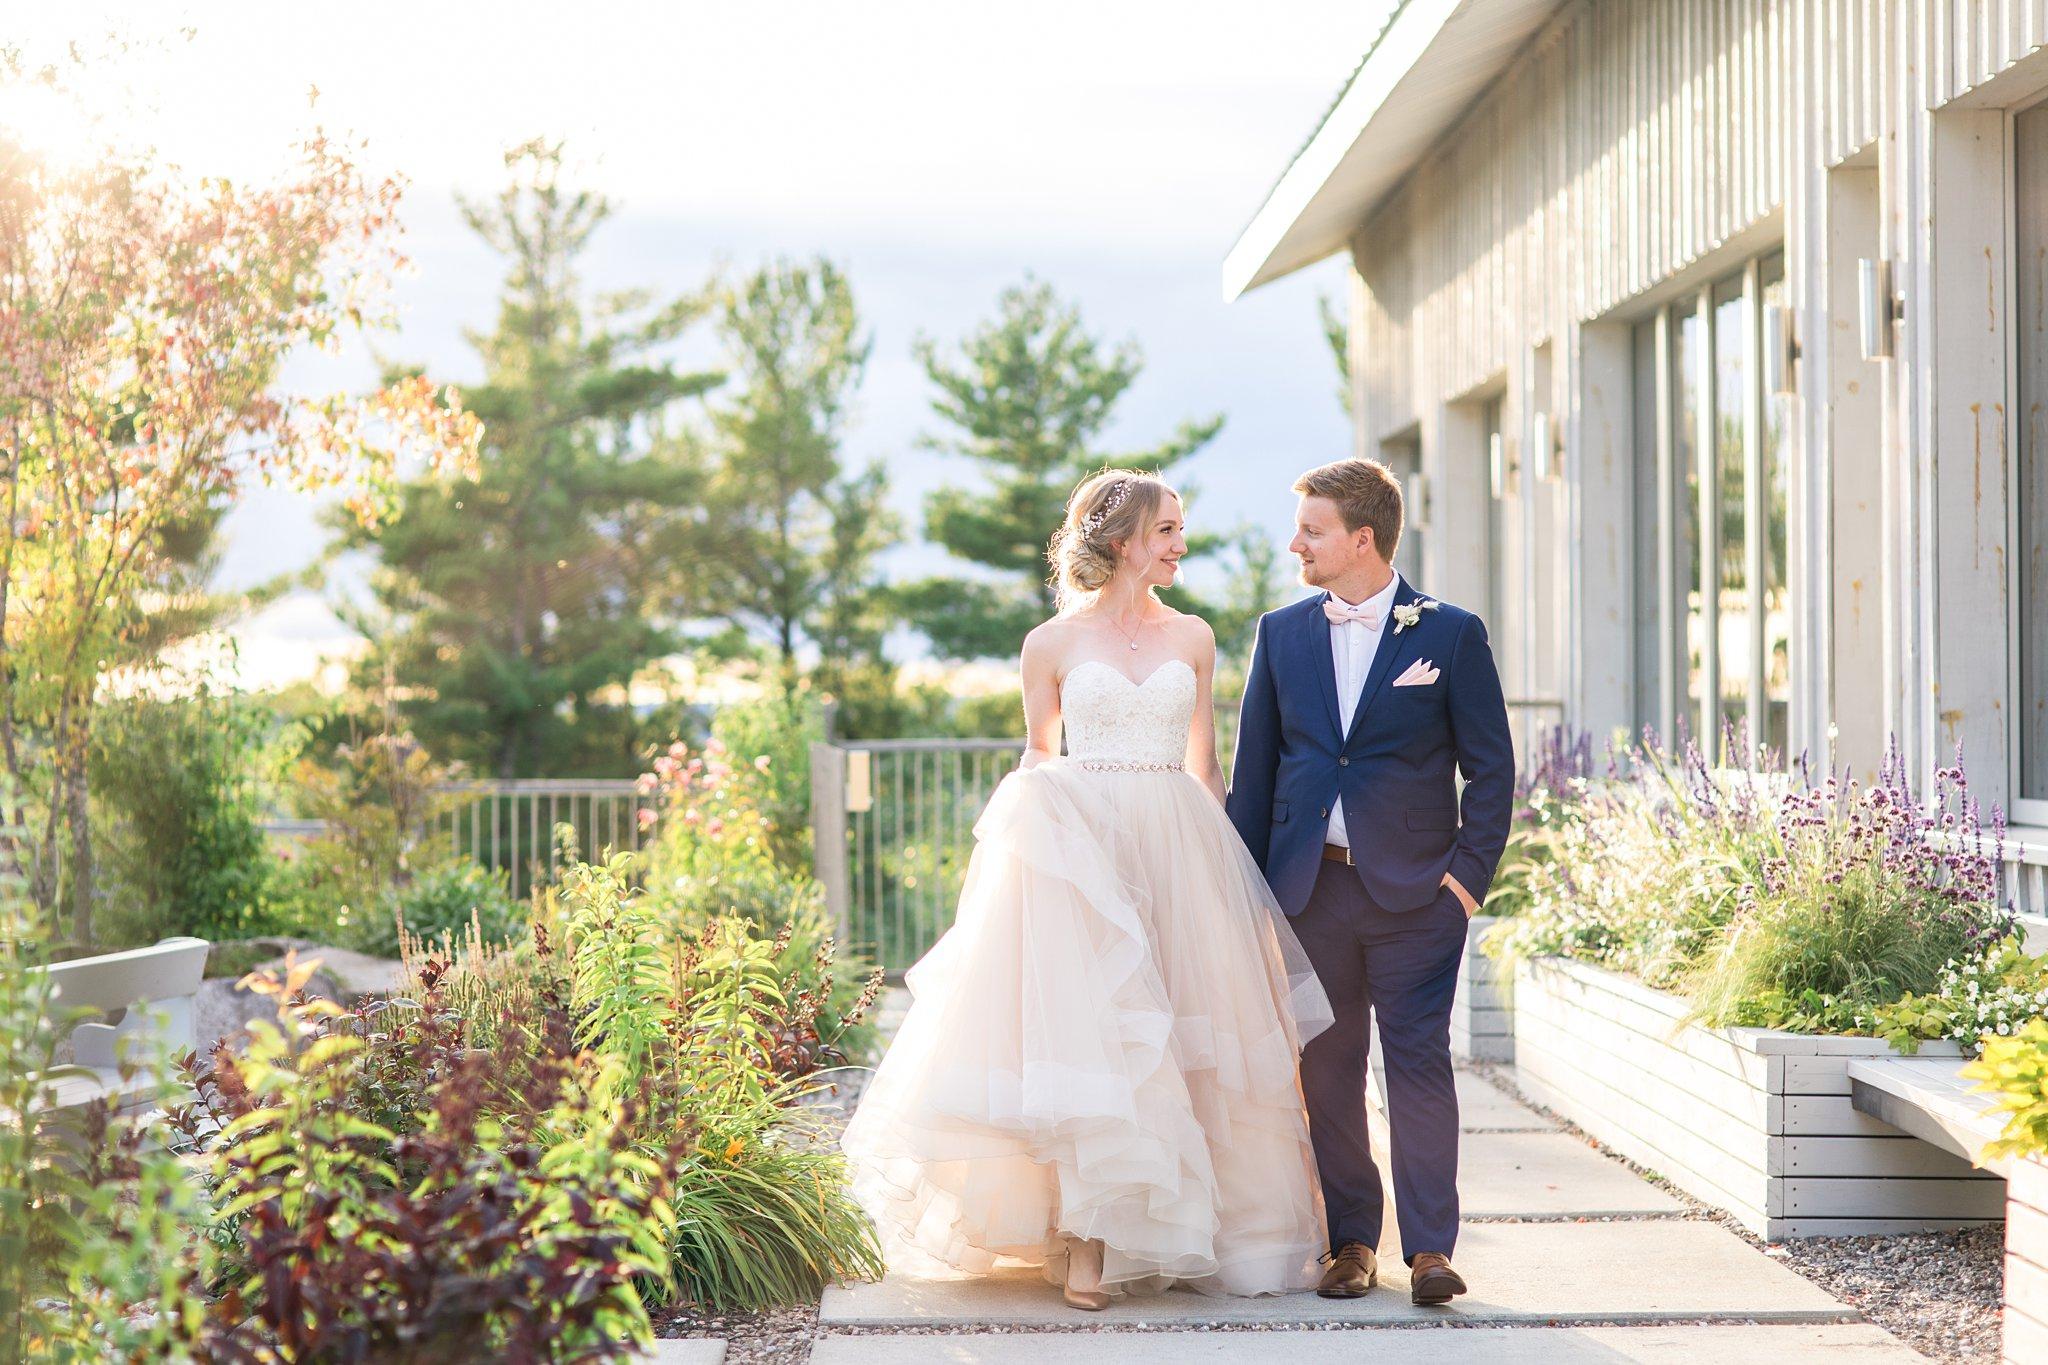 Sunset photos, Wakefield wedding photos, Le Belvedere